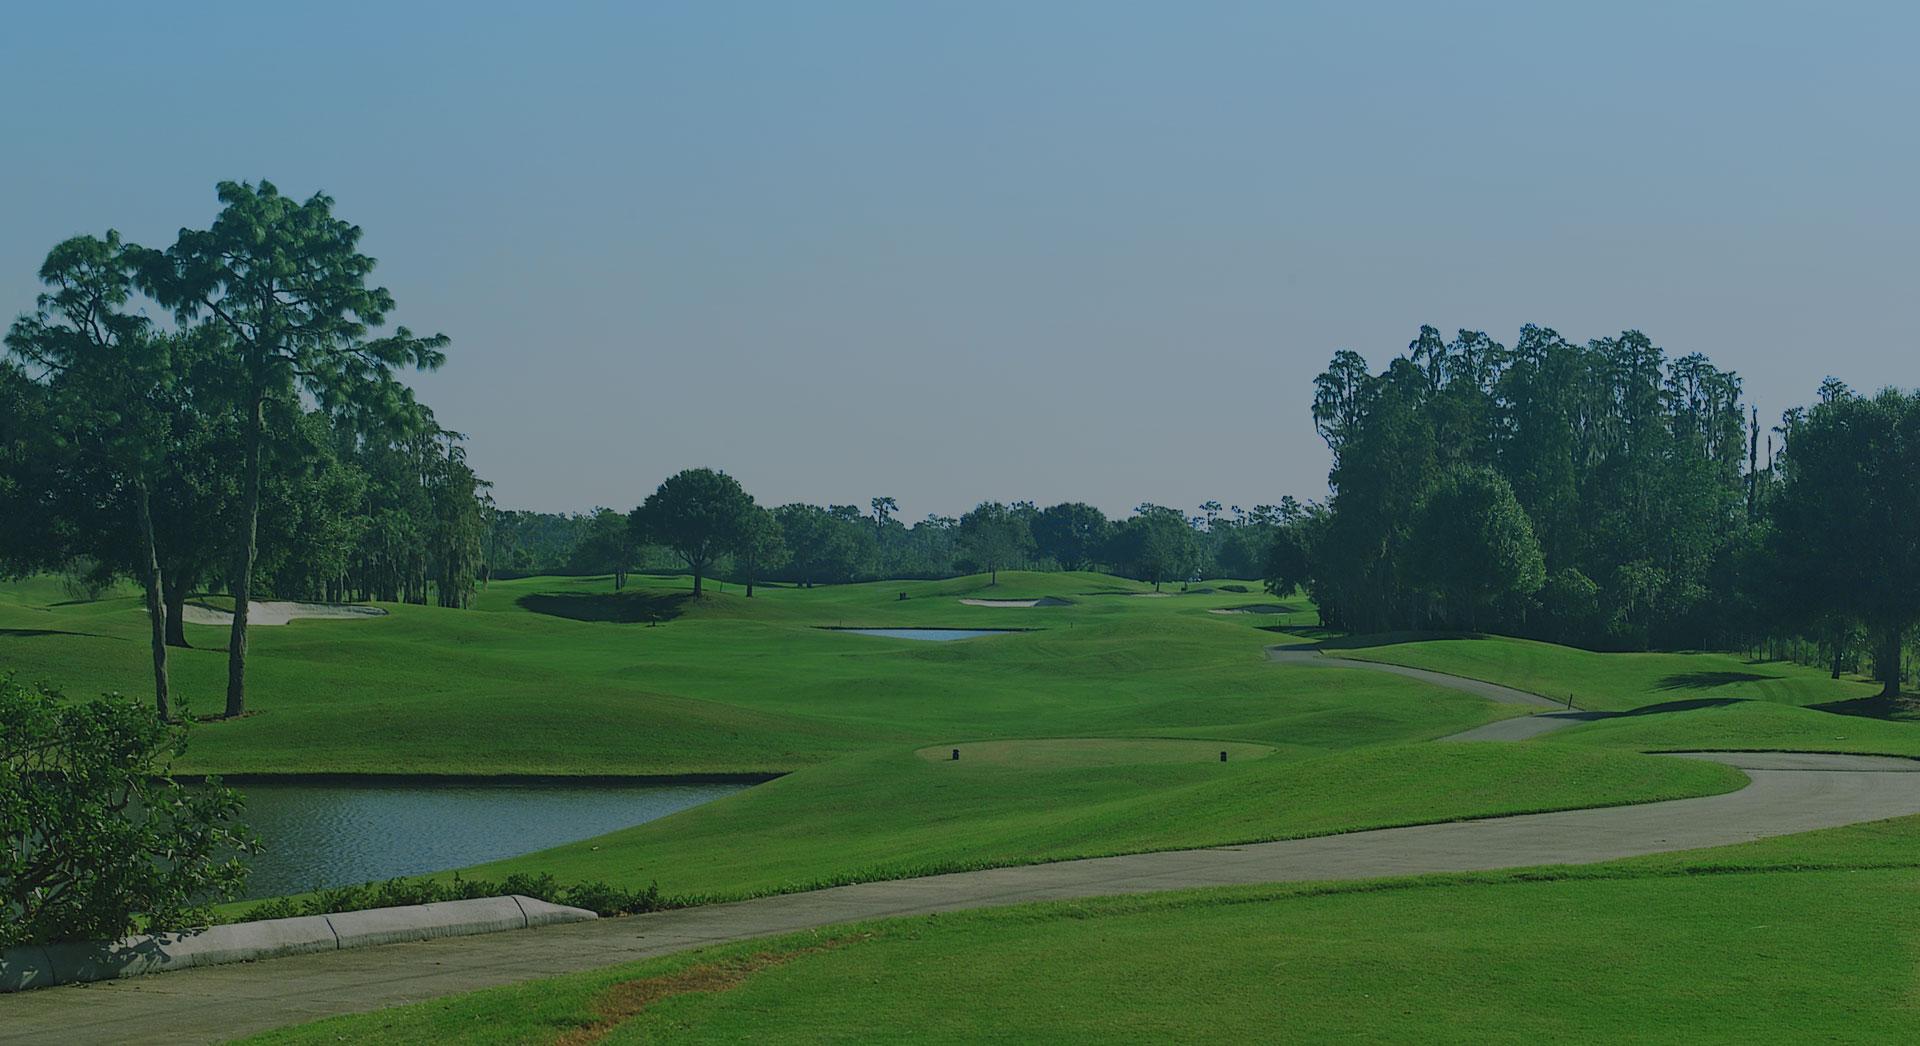 golf-course-bg-2.jpg